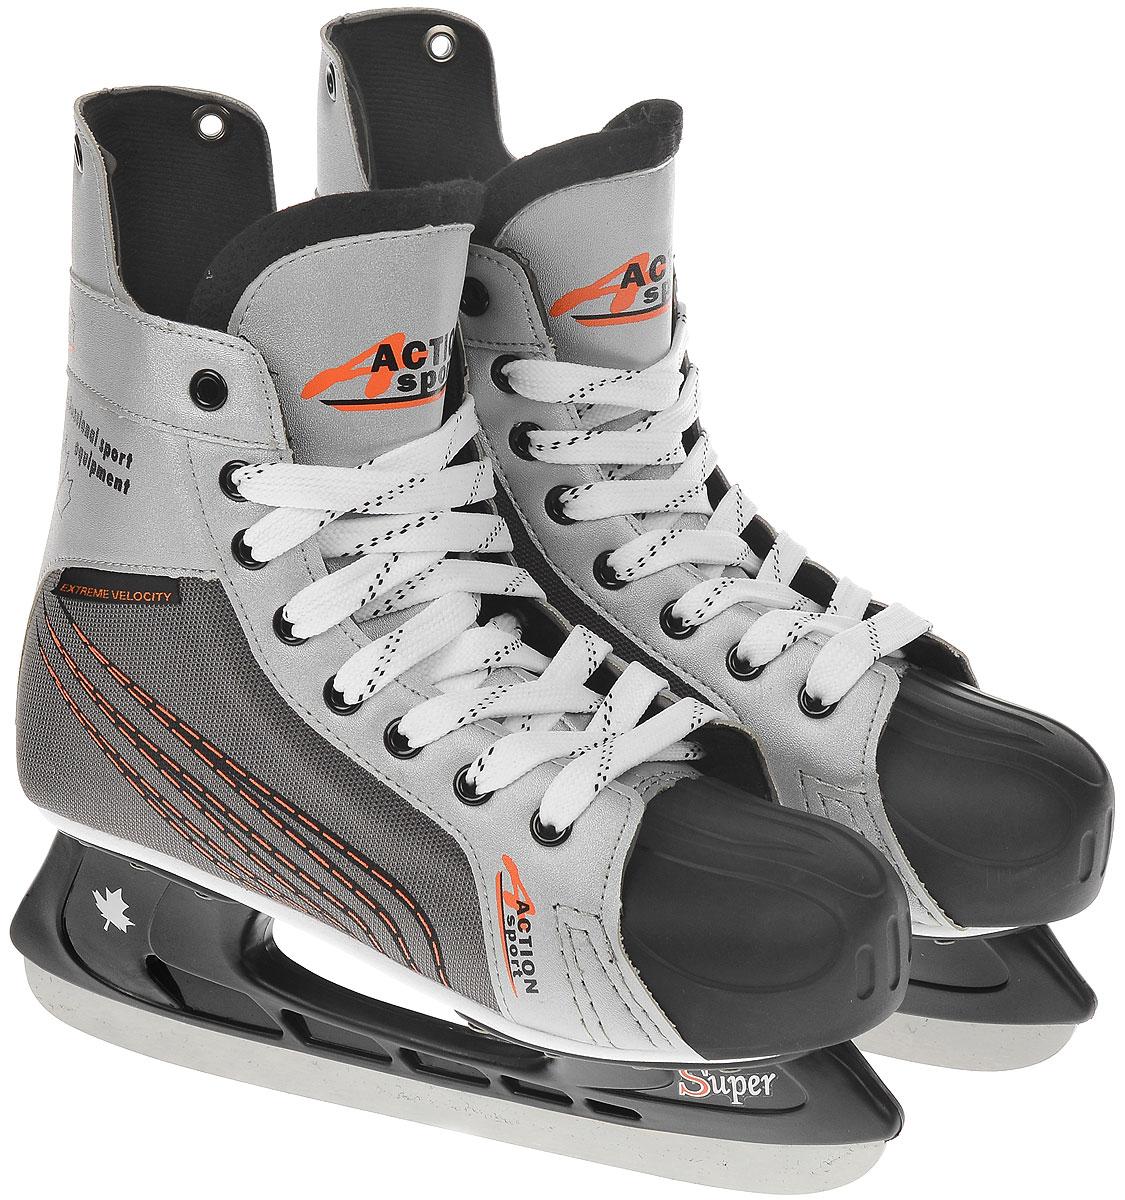 Коньки хоккейные мужские Action, цвет: белый, серый. PW-216N. Размер 38